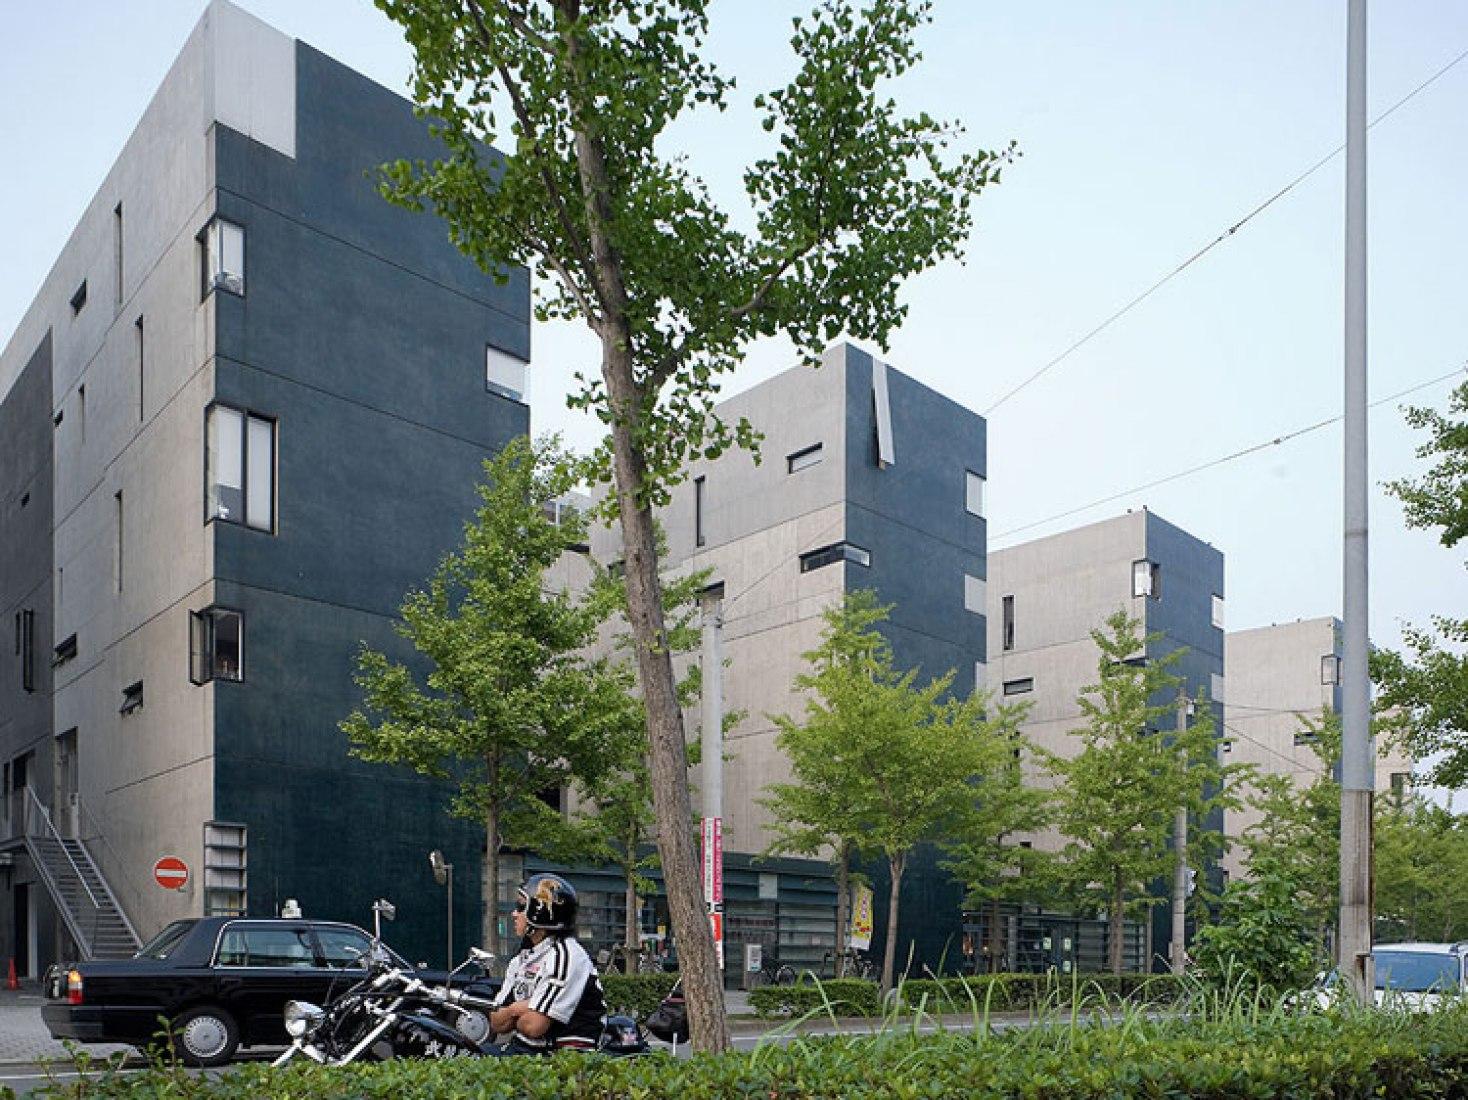 Void Space / Hinged Space Housing, 1991 Fukuoka, Japan. Photography © Hidetoshi Furuie. Courtesy of Praemium Imperiale.